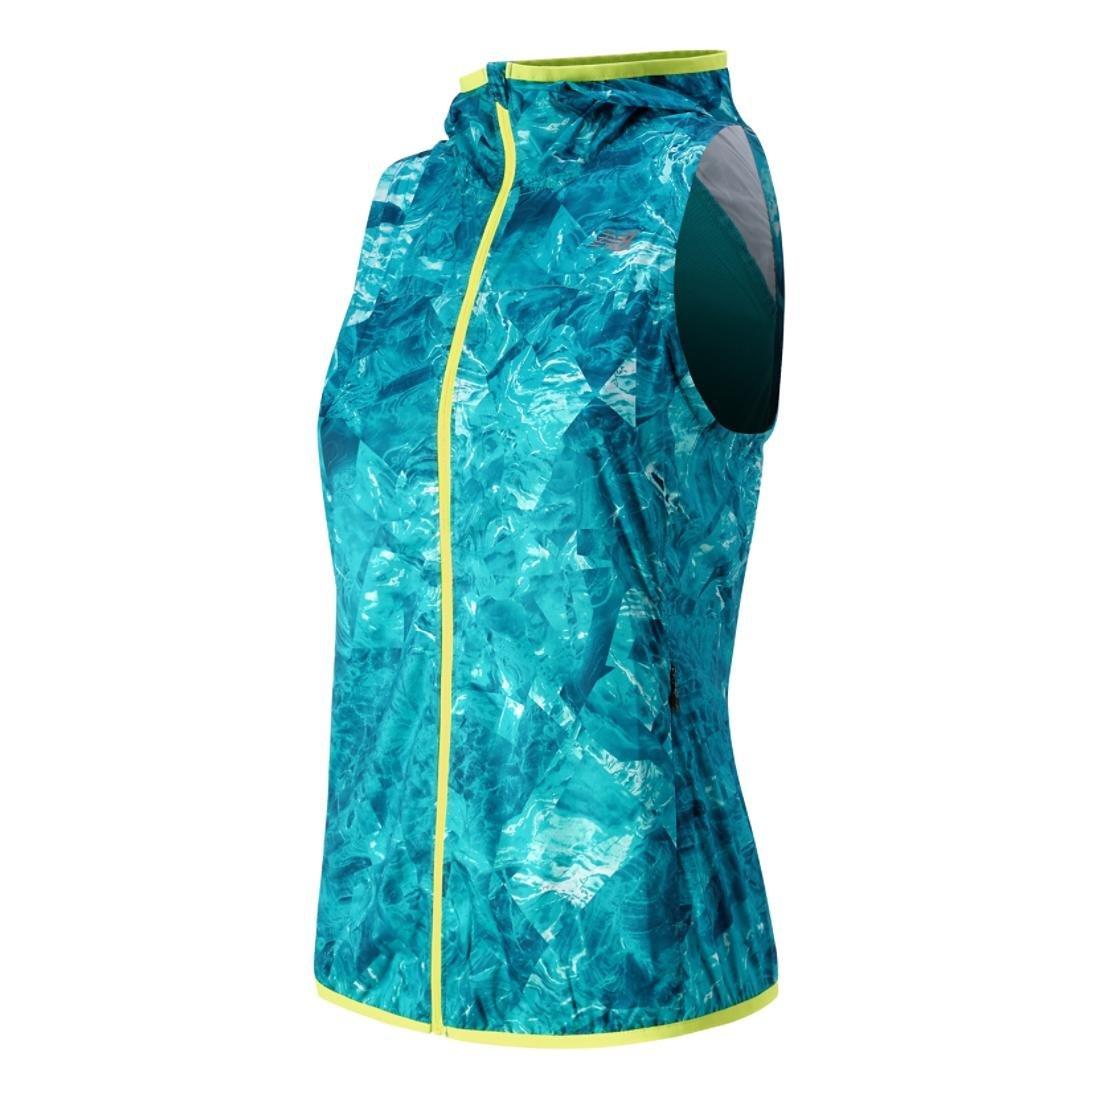 New Balance Women's Windcheater Vest, Sea Glass Print, Small